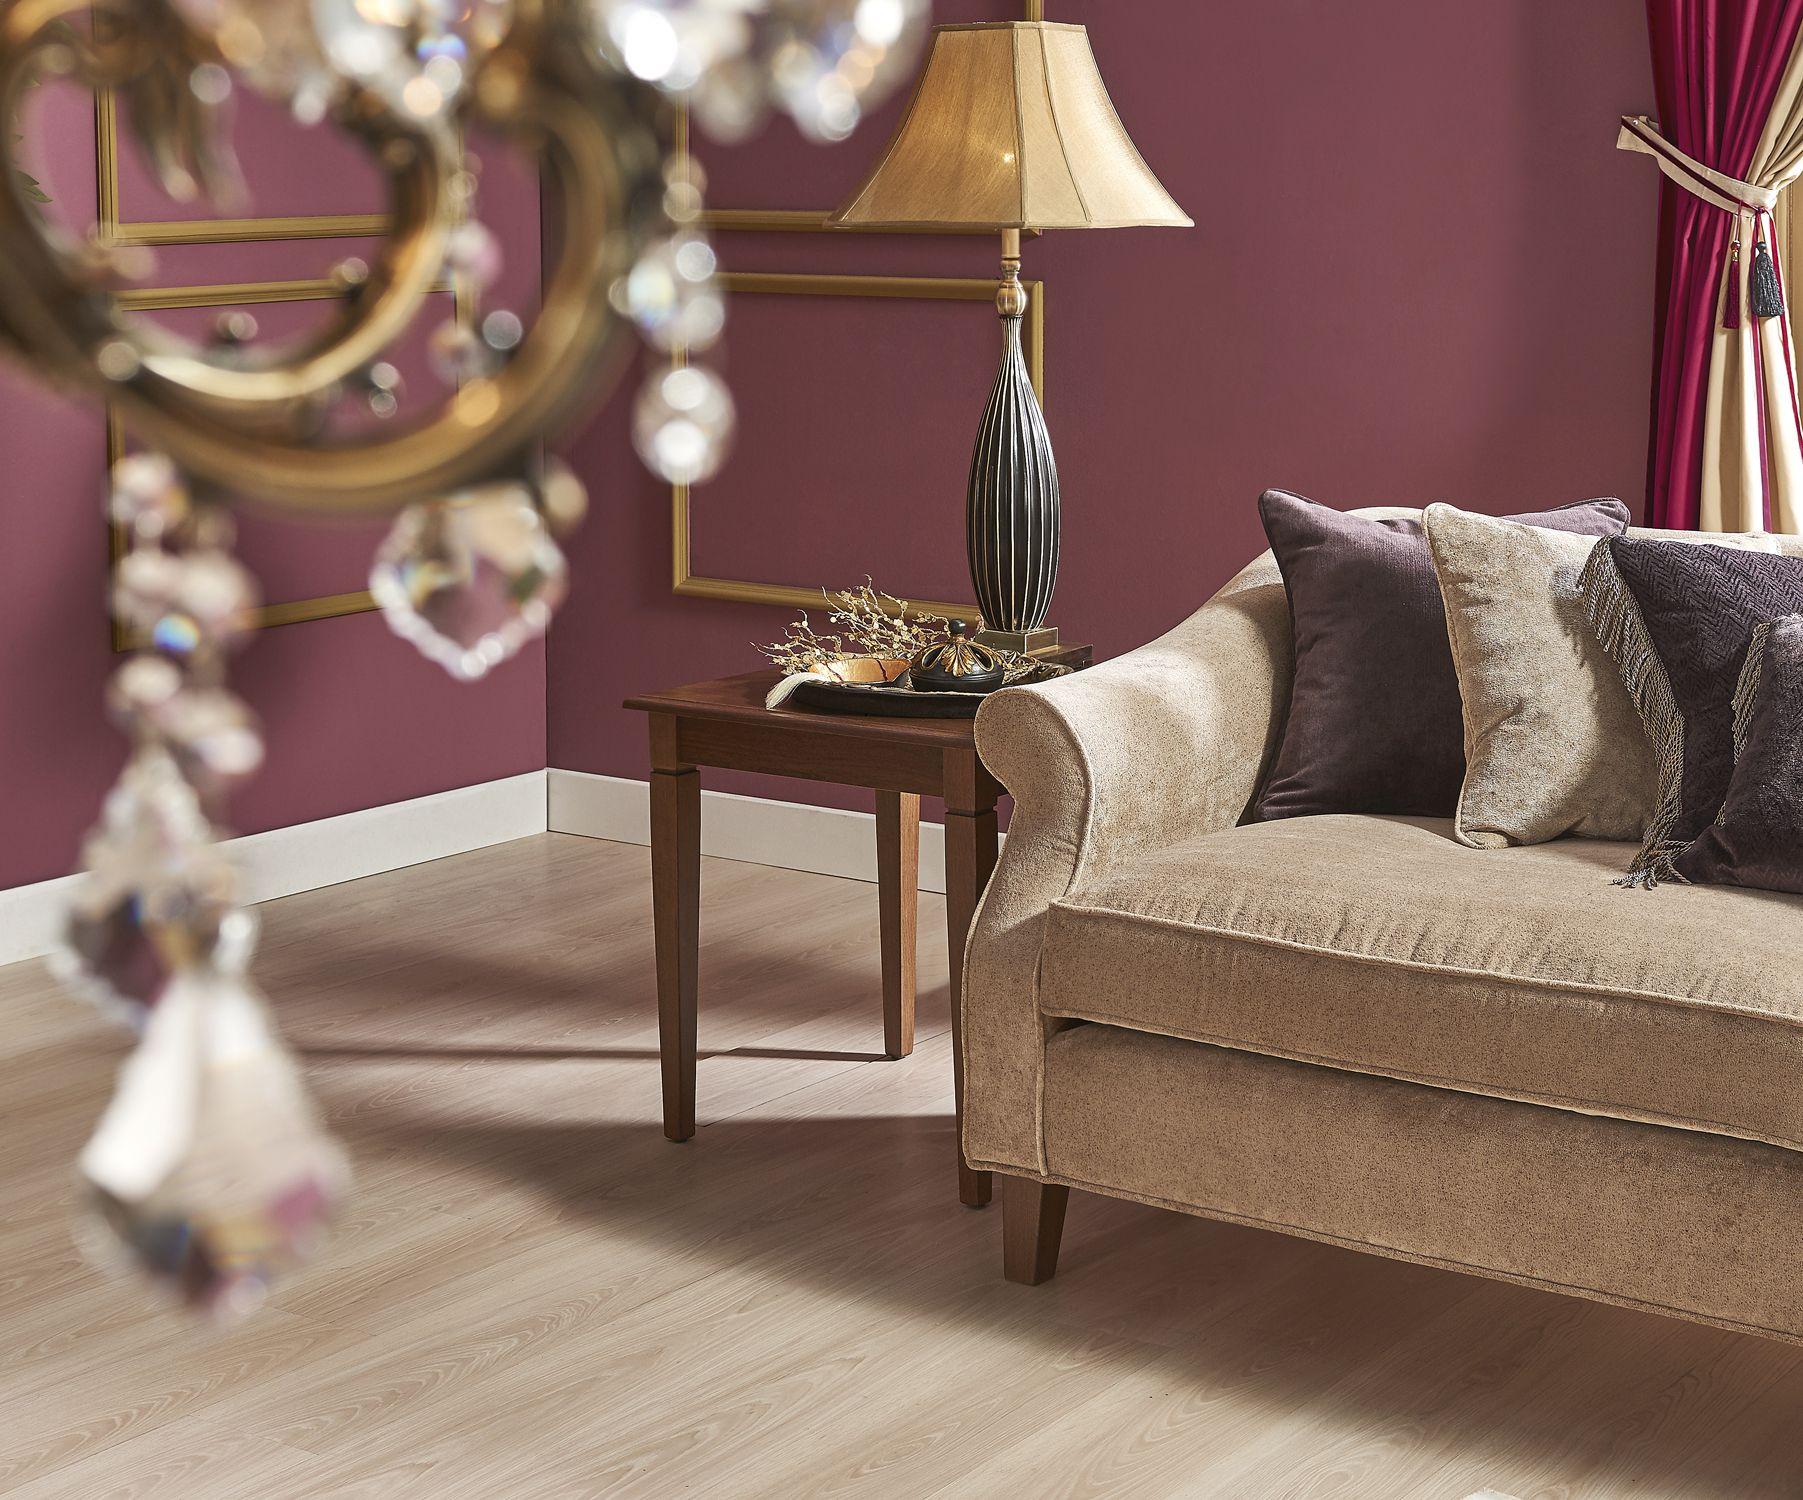 Tepe Home Adli Kullanicinin Salon Takimlari Living Rooms Panosundaki Pin Dekorasyon